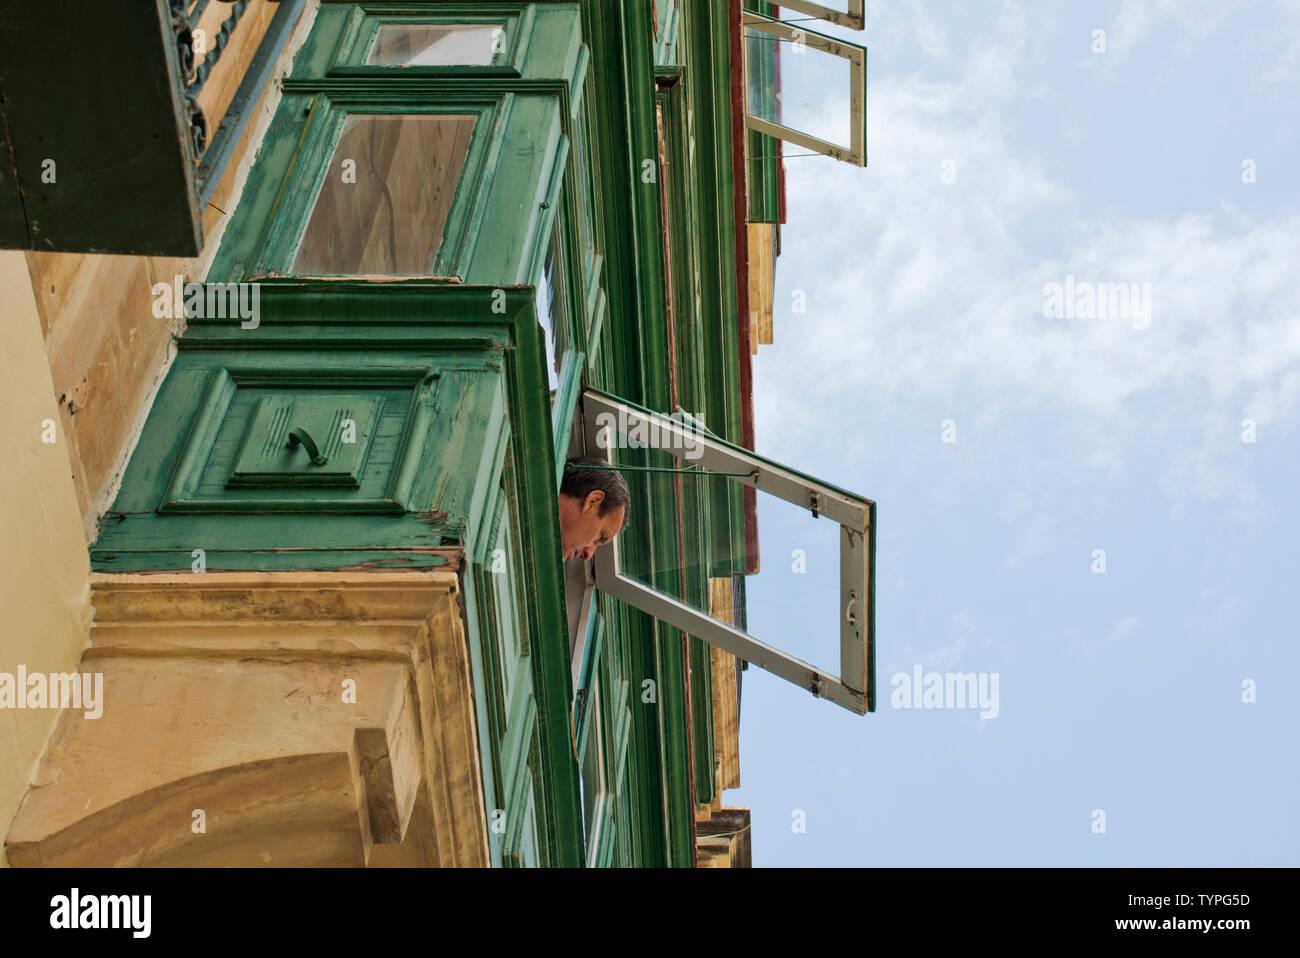 Beautiful elaborate Baroque architectural buildings in Valletta Malta's capital city centre streets - Stock Image